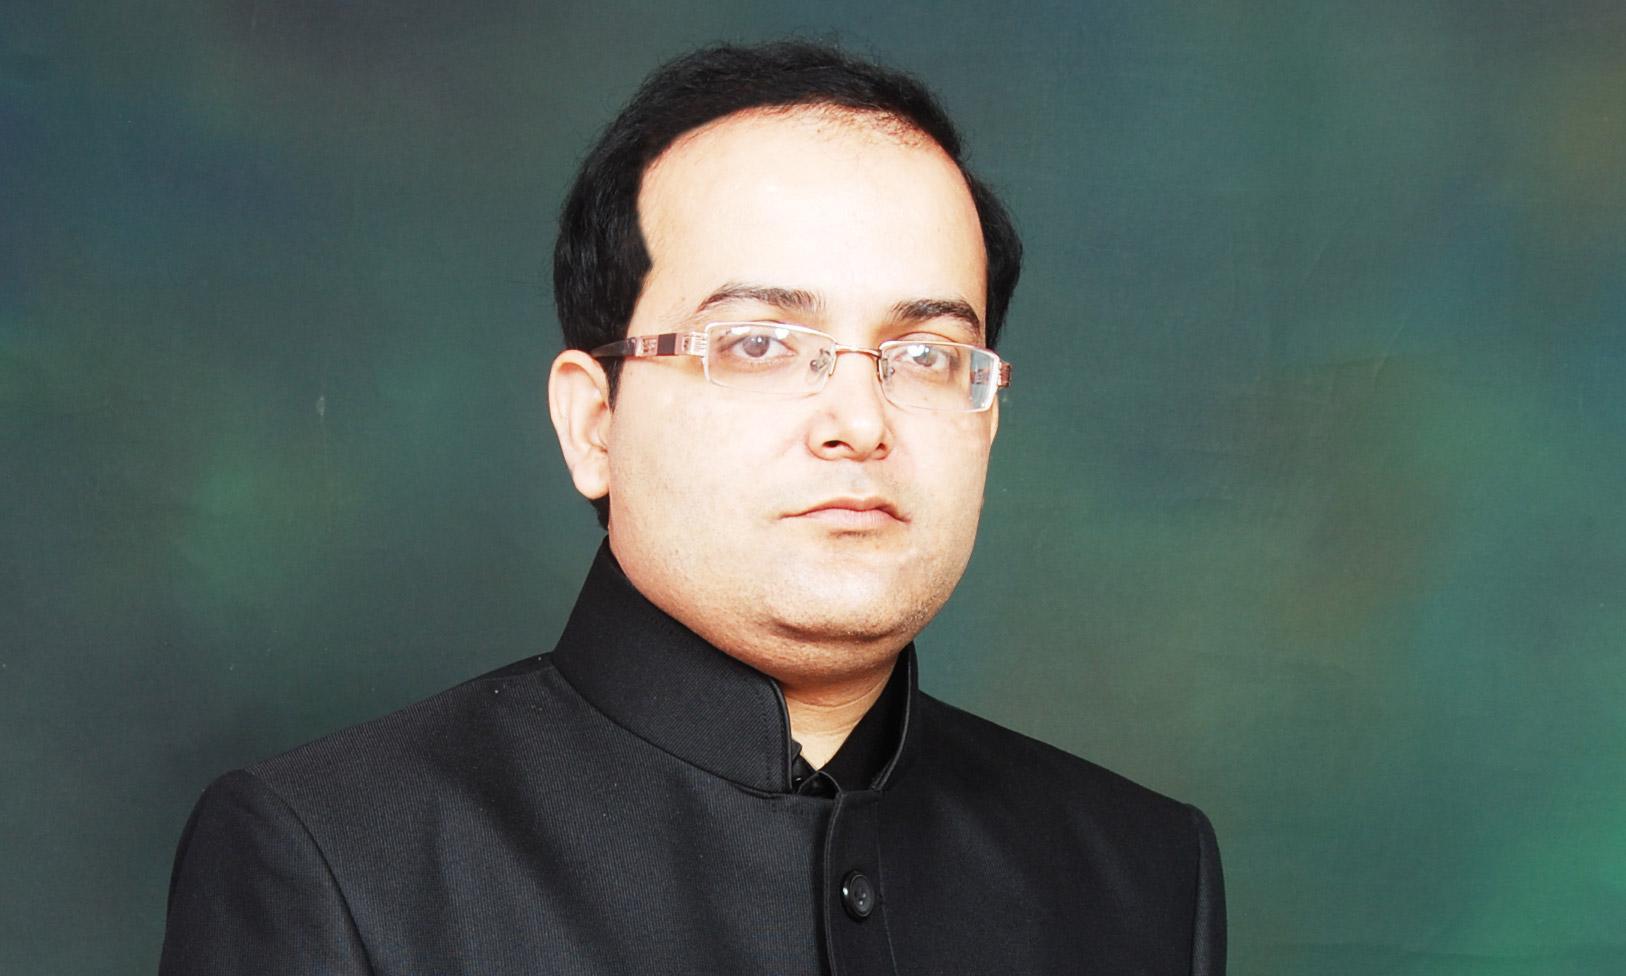 Mohit Kaushal